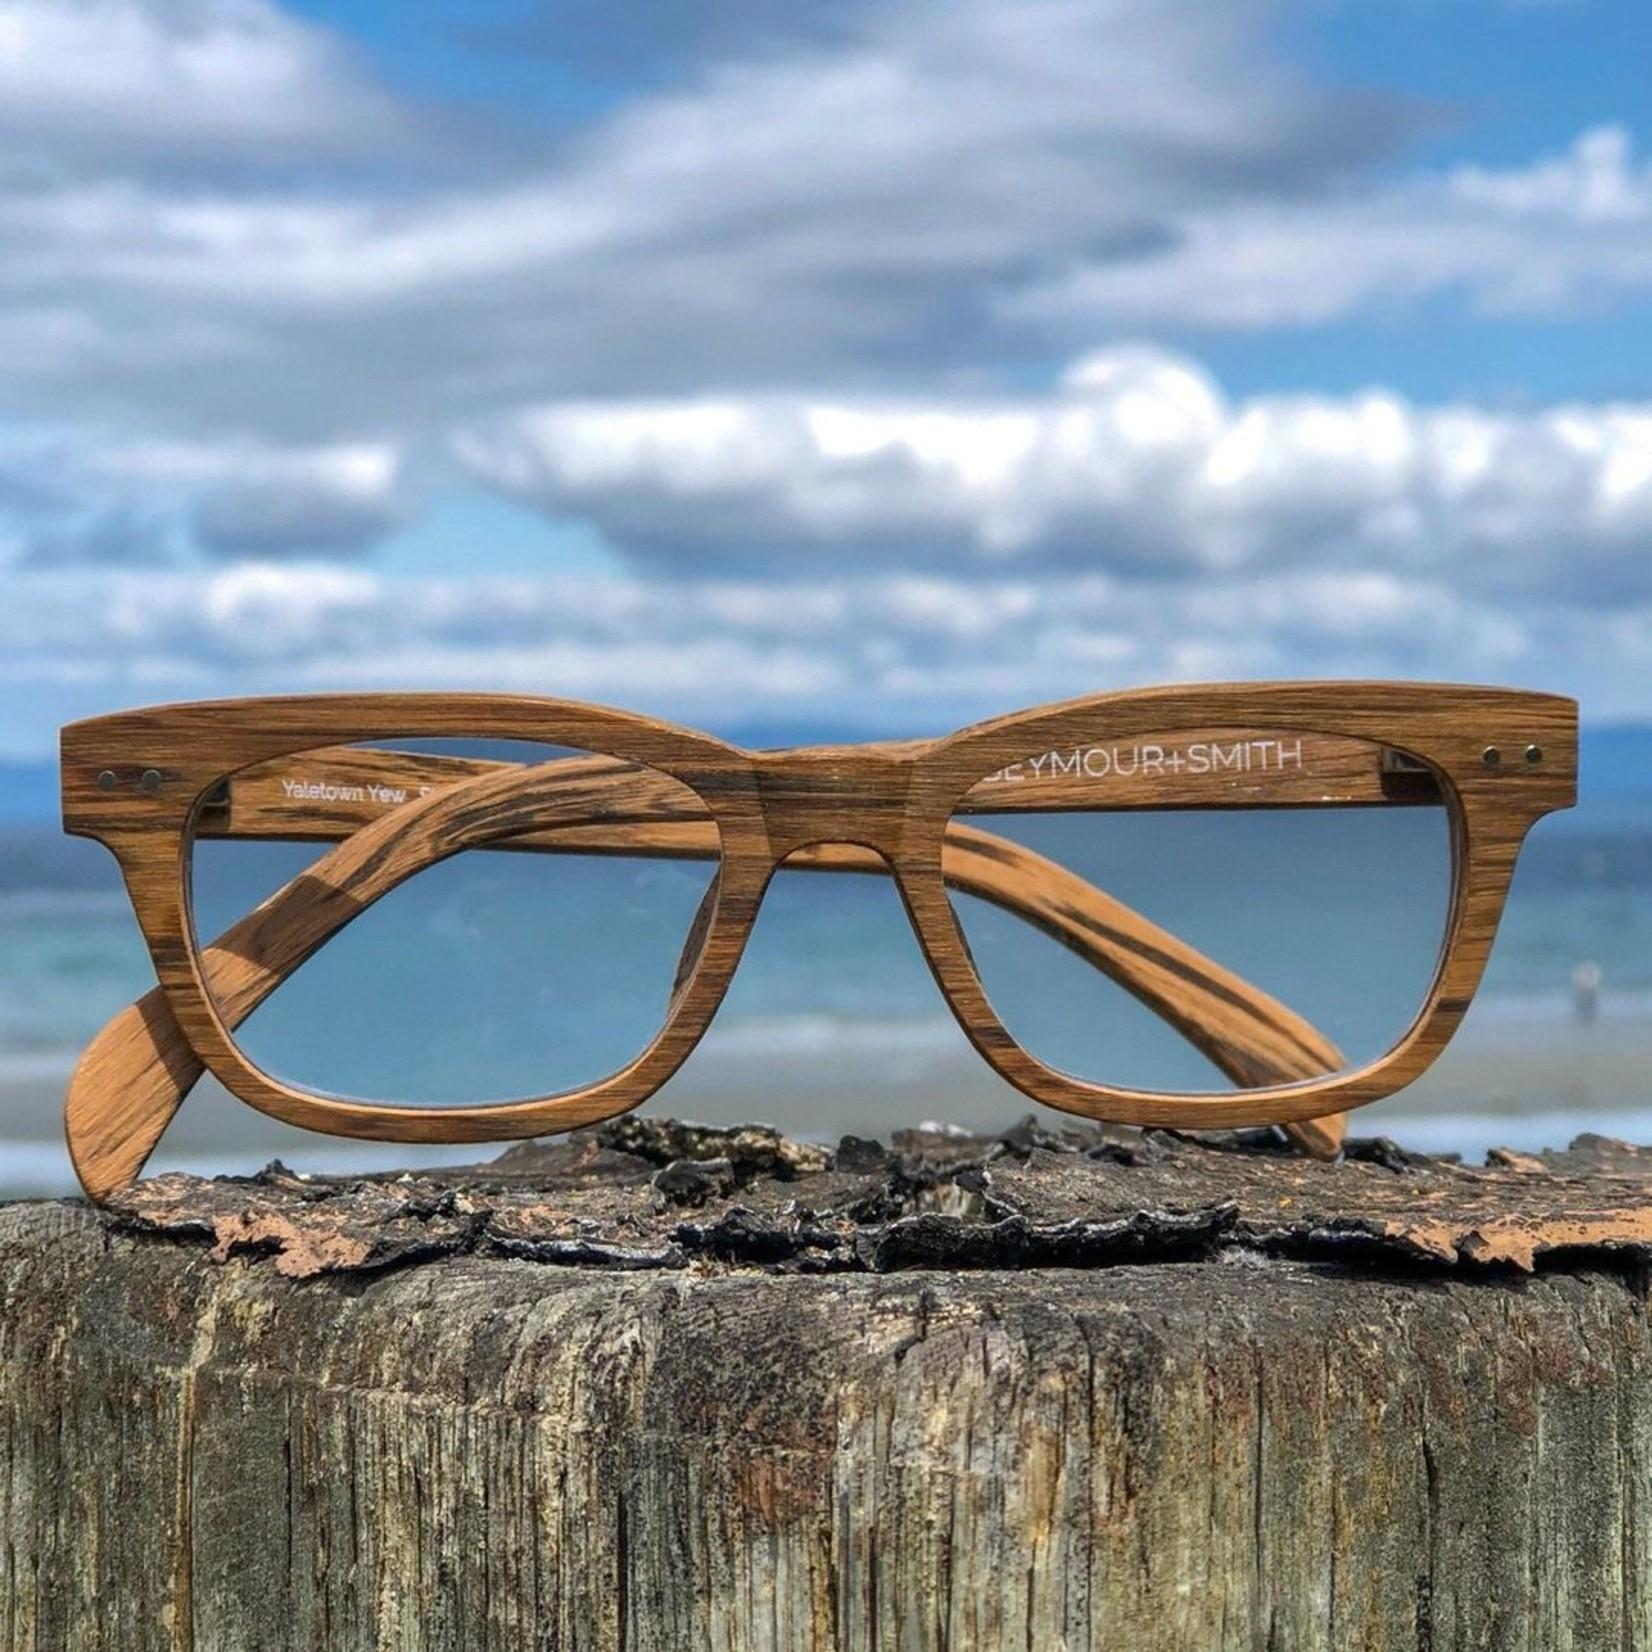 Seymour + Smith Yaletown Yew Reading Glasses